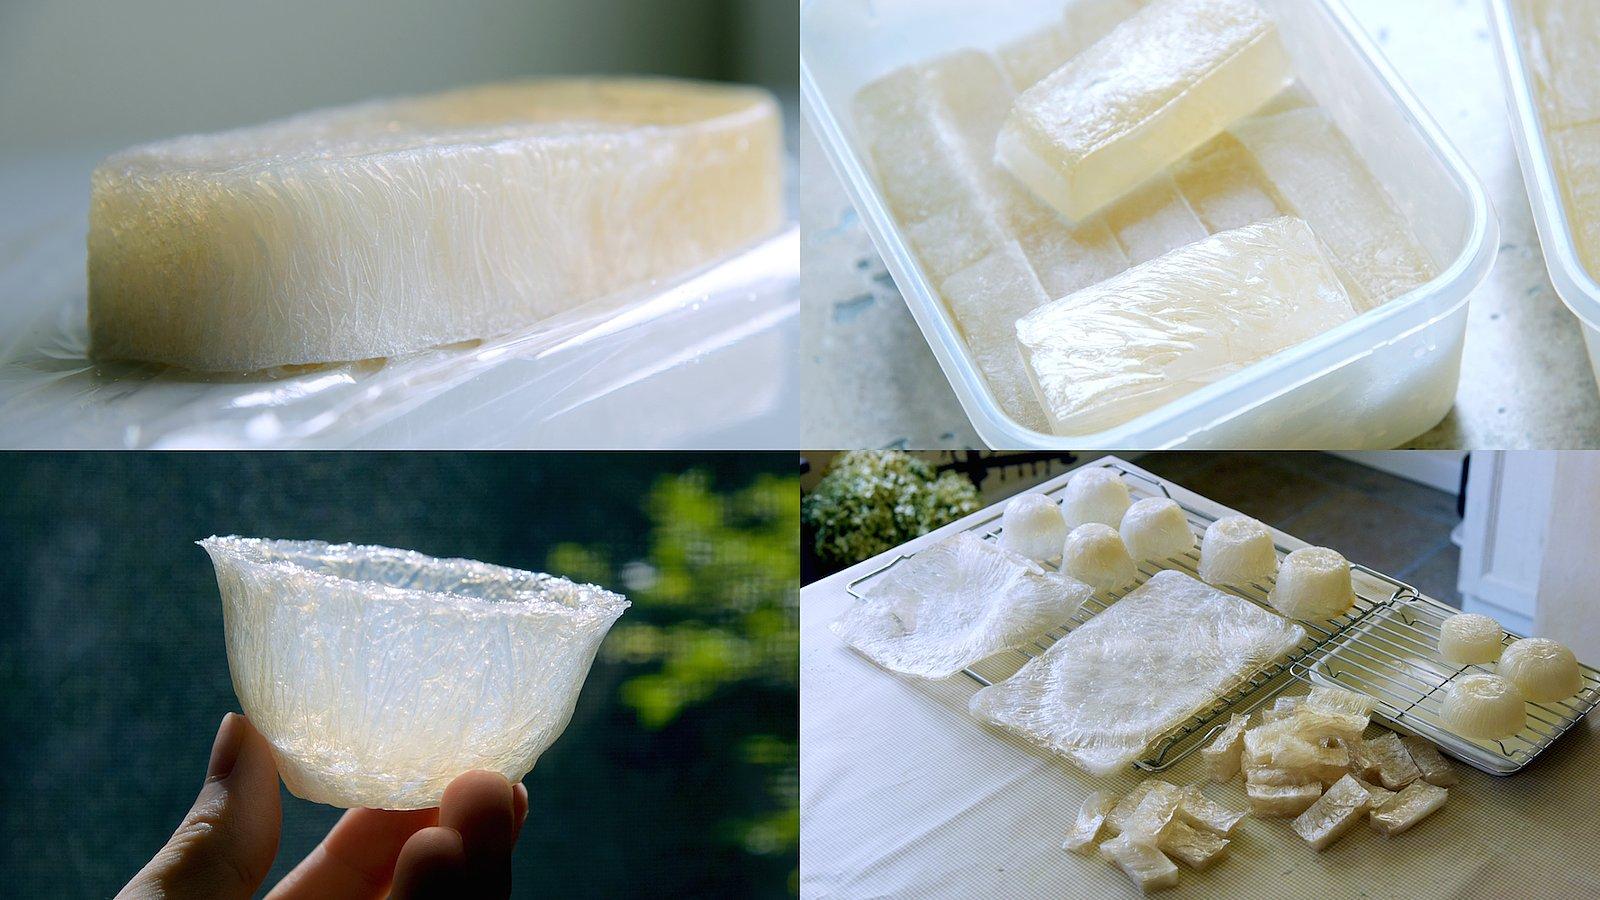 new seaweed based material packaging design 1